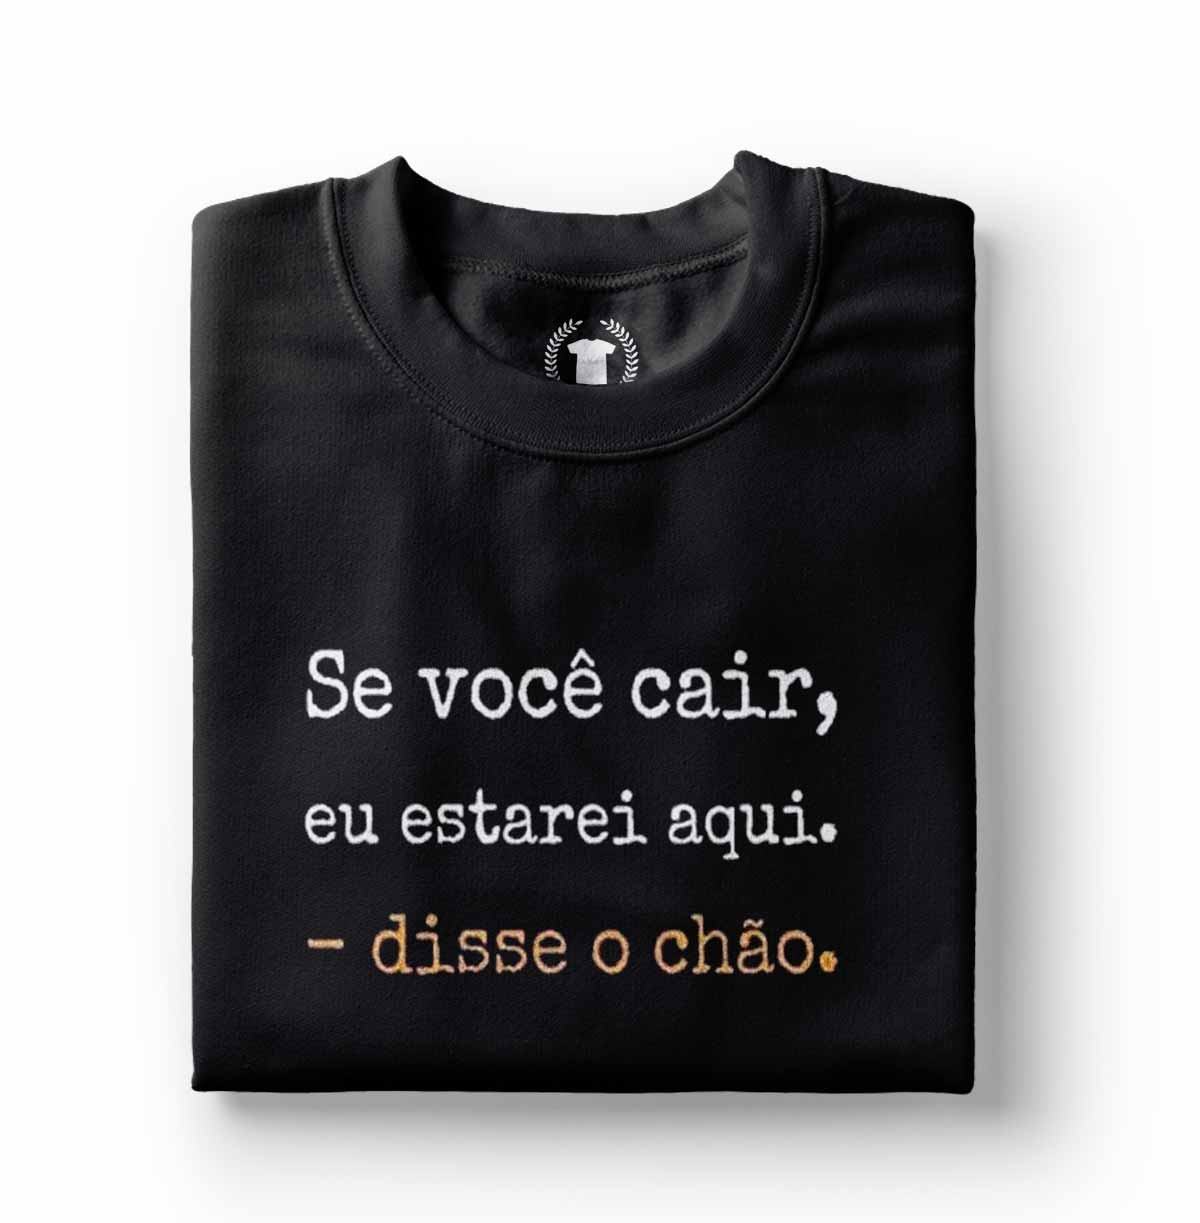 Camiseta Humor Se voce cair estarei aqui frases engracadas